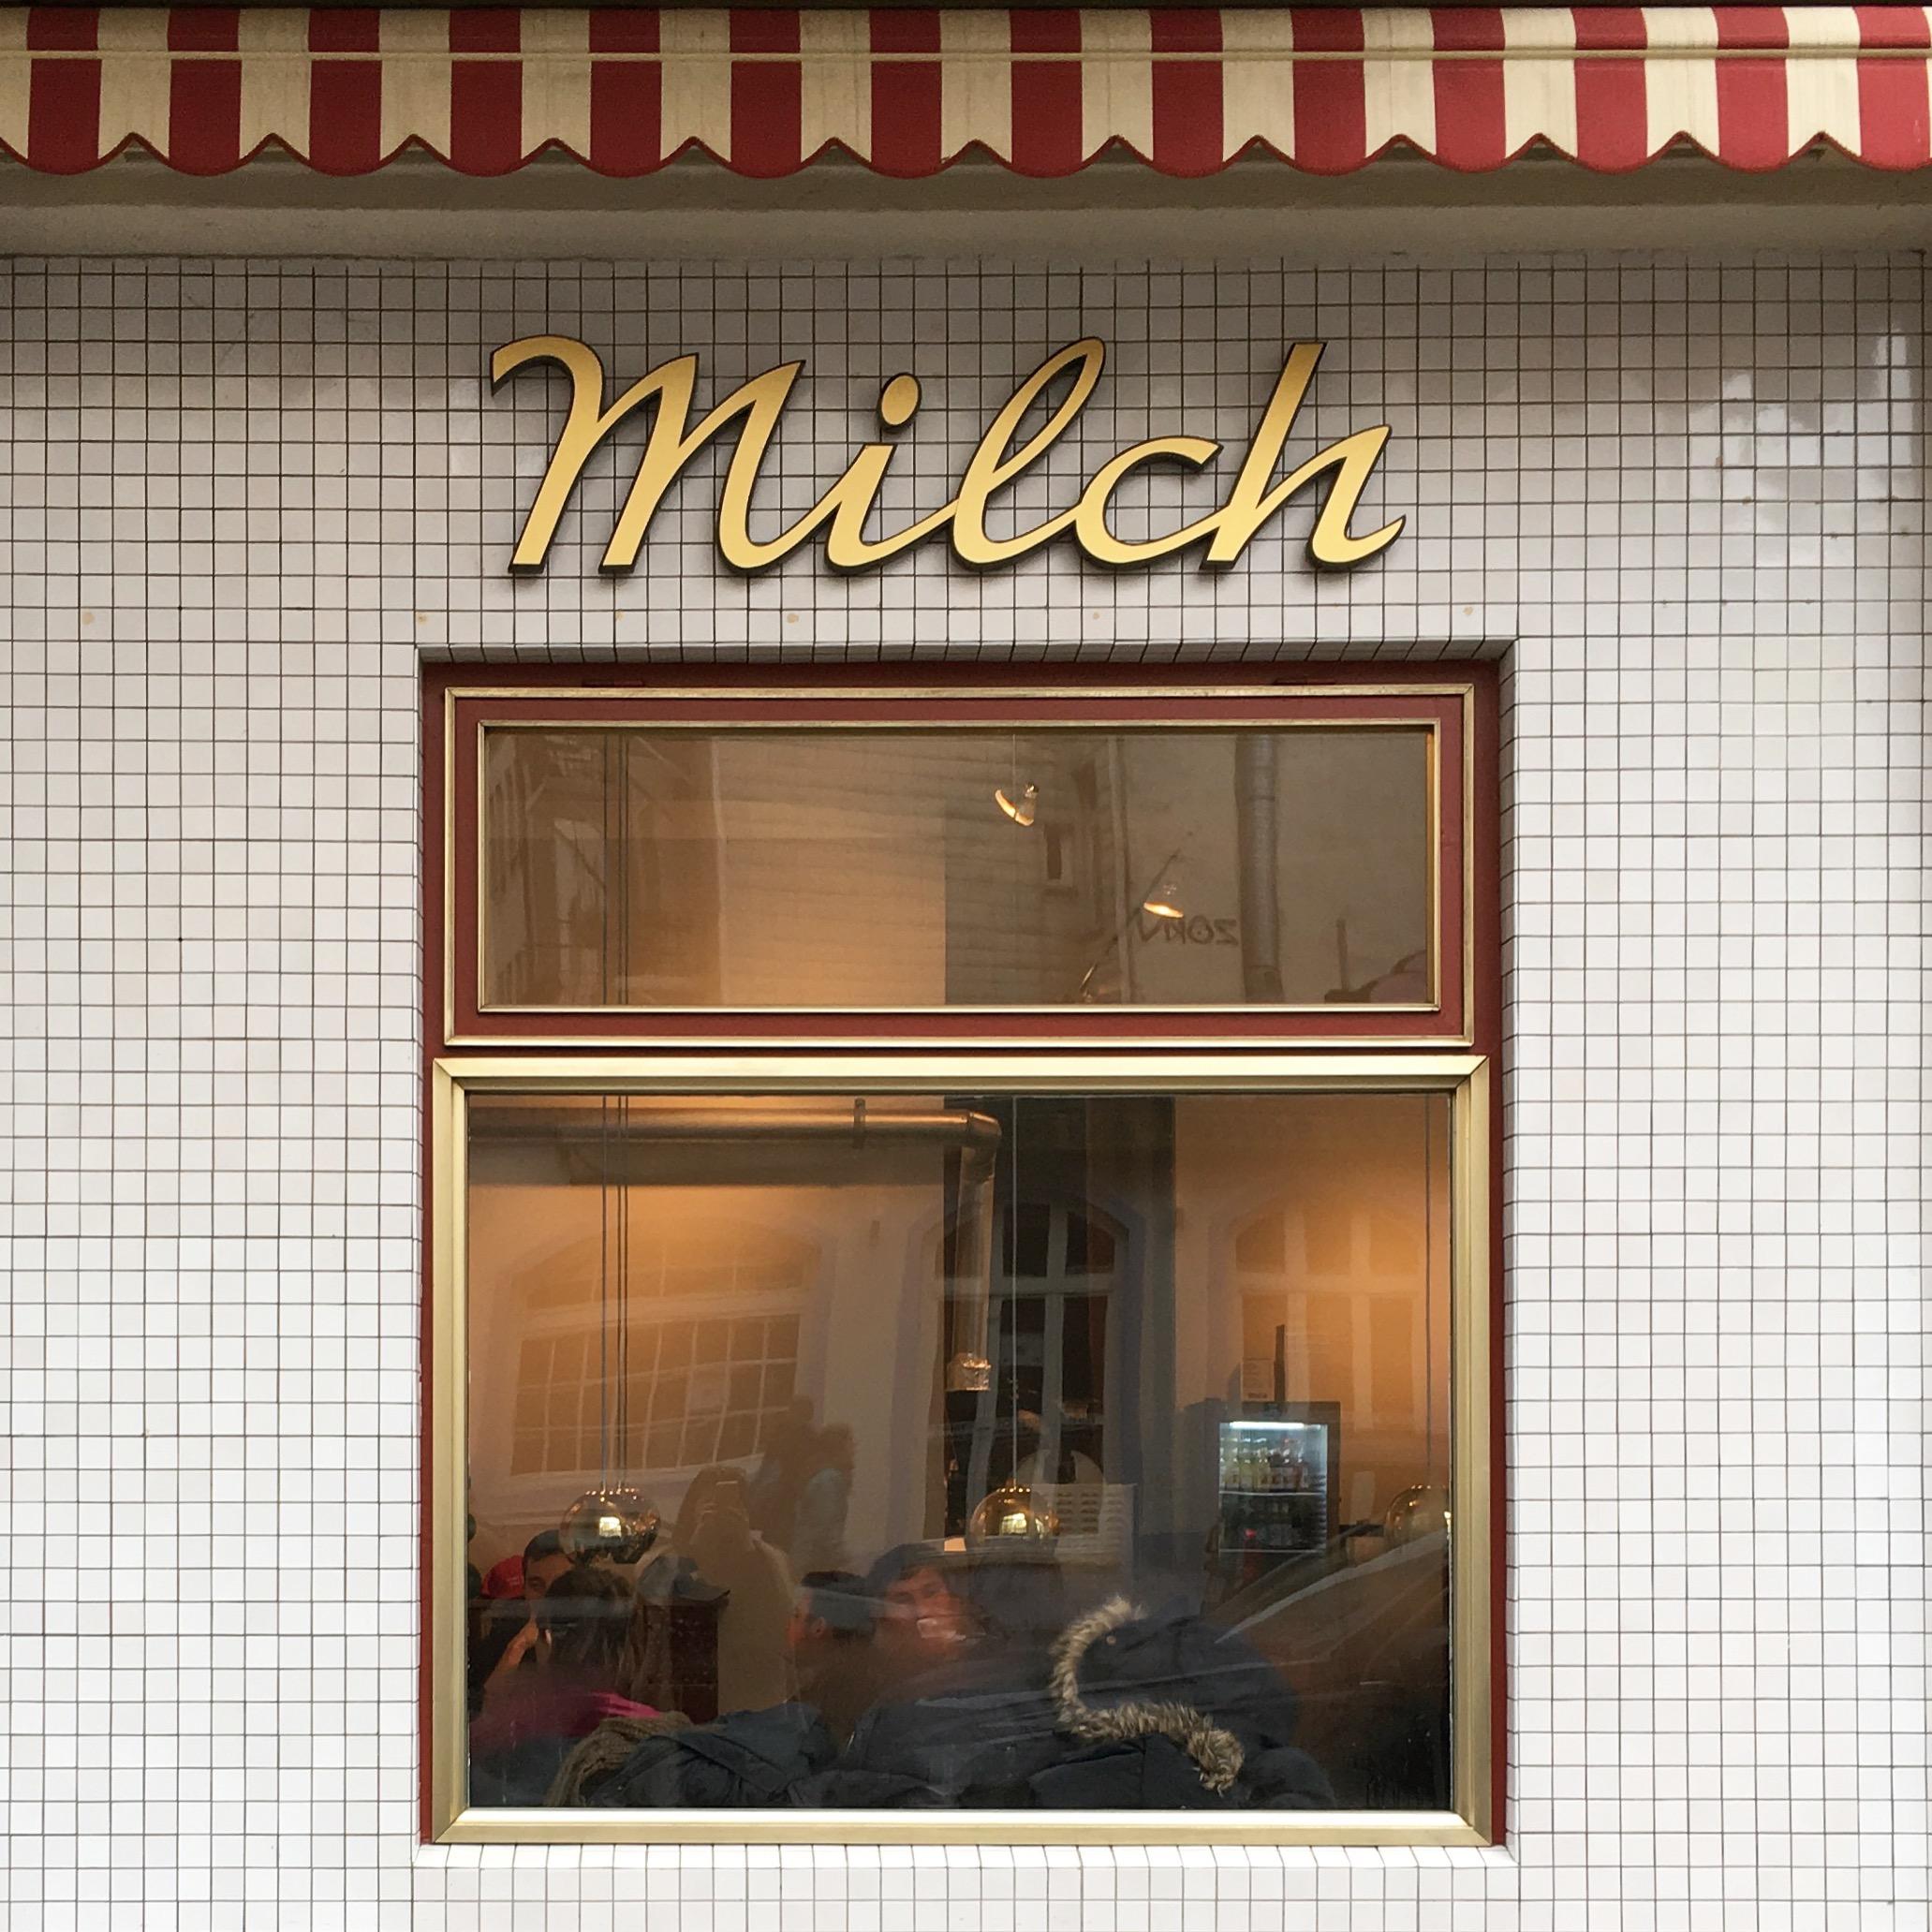 Lozidaze_Milch-Feinkost_01